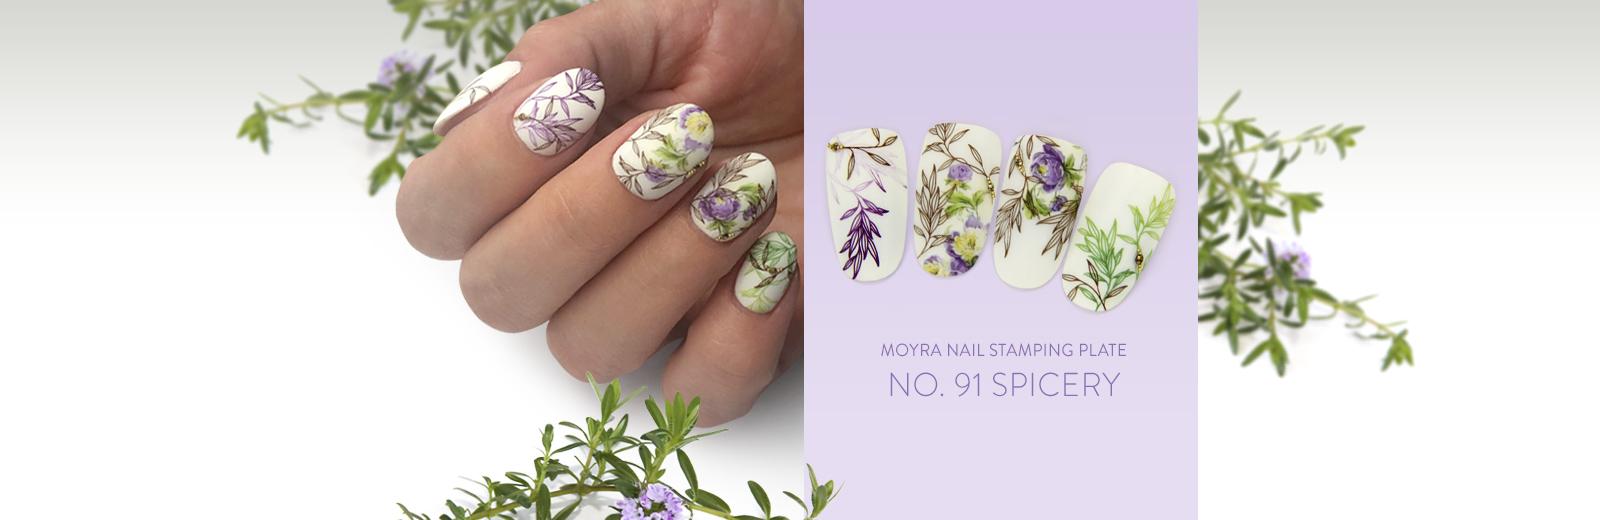 Moyra nail art stamping plate No. 91 Spicery